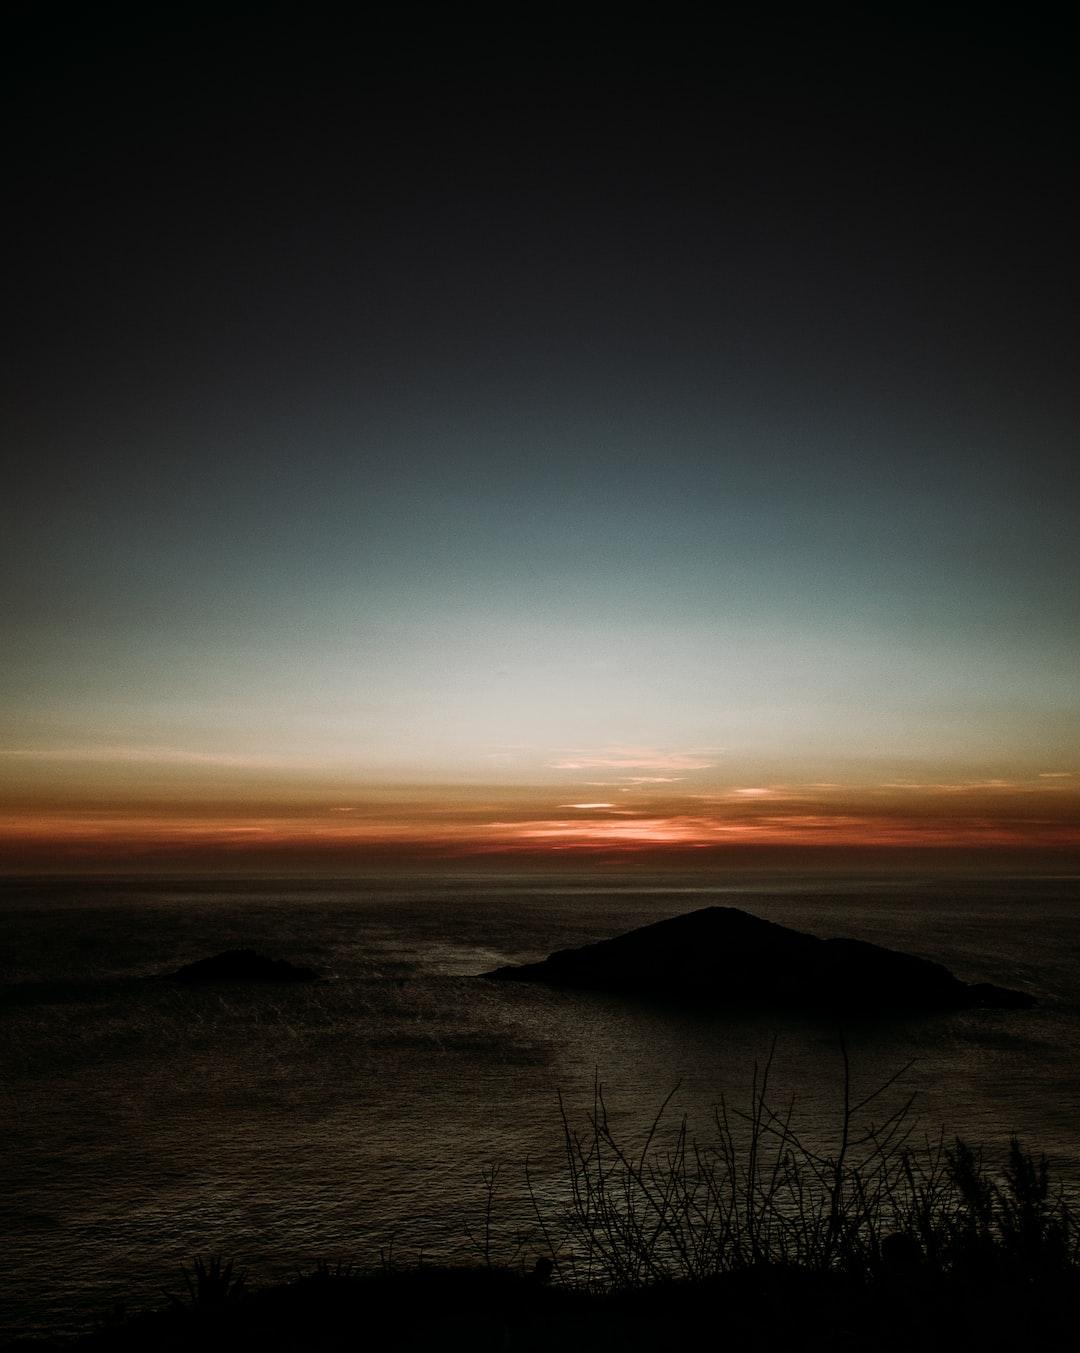 sunset at pontal do atalaia, rio